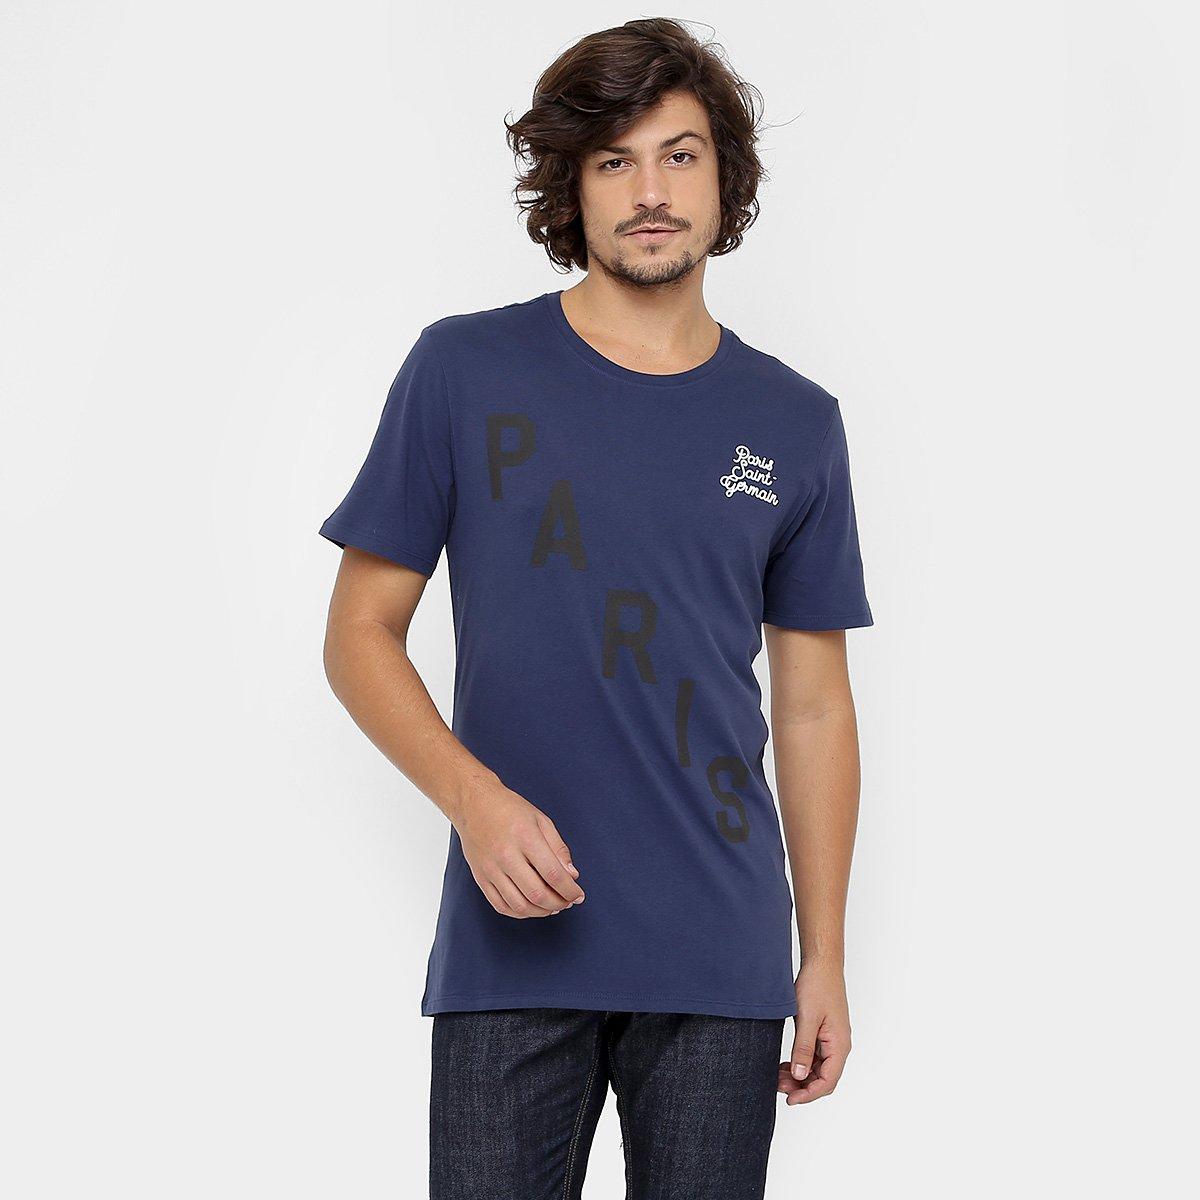 a65070e4158d8 Camiseta Paris Saint-Germain Tee Squadra Nike Masculina